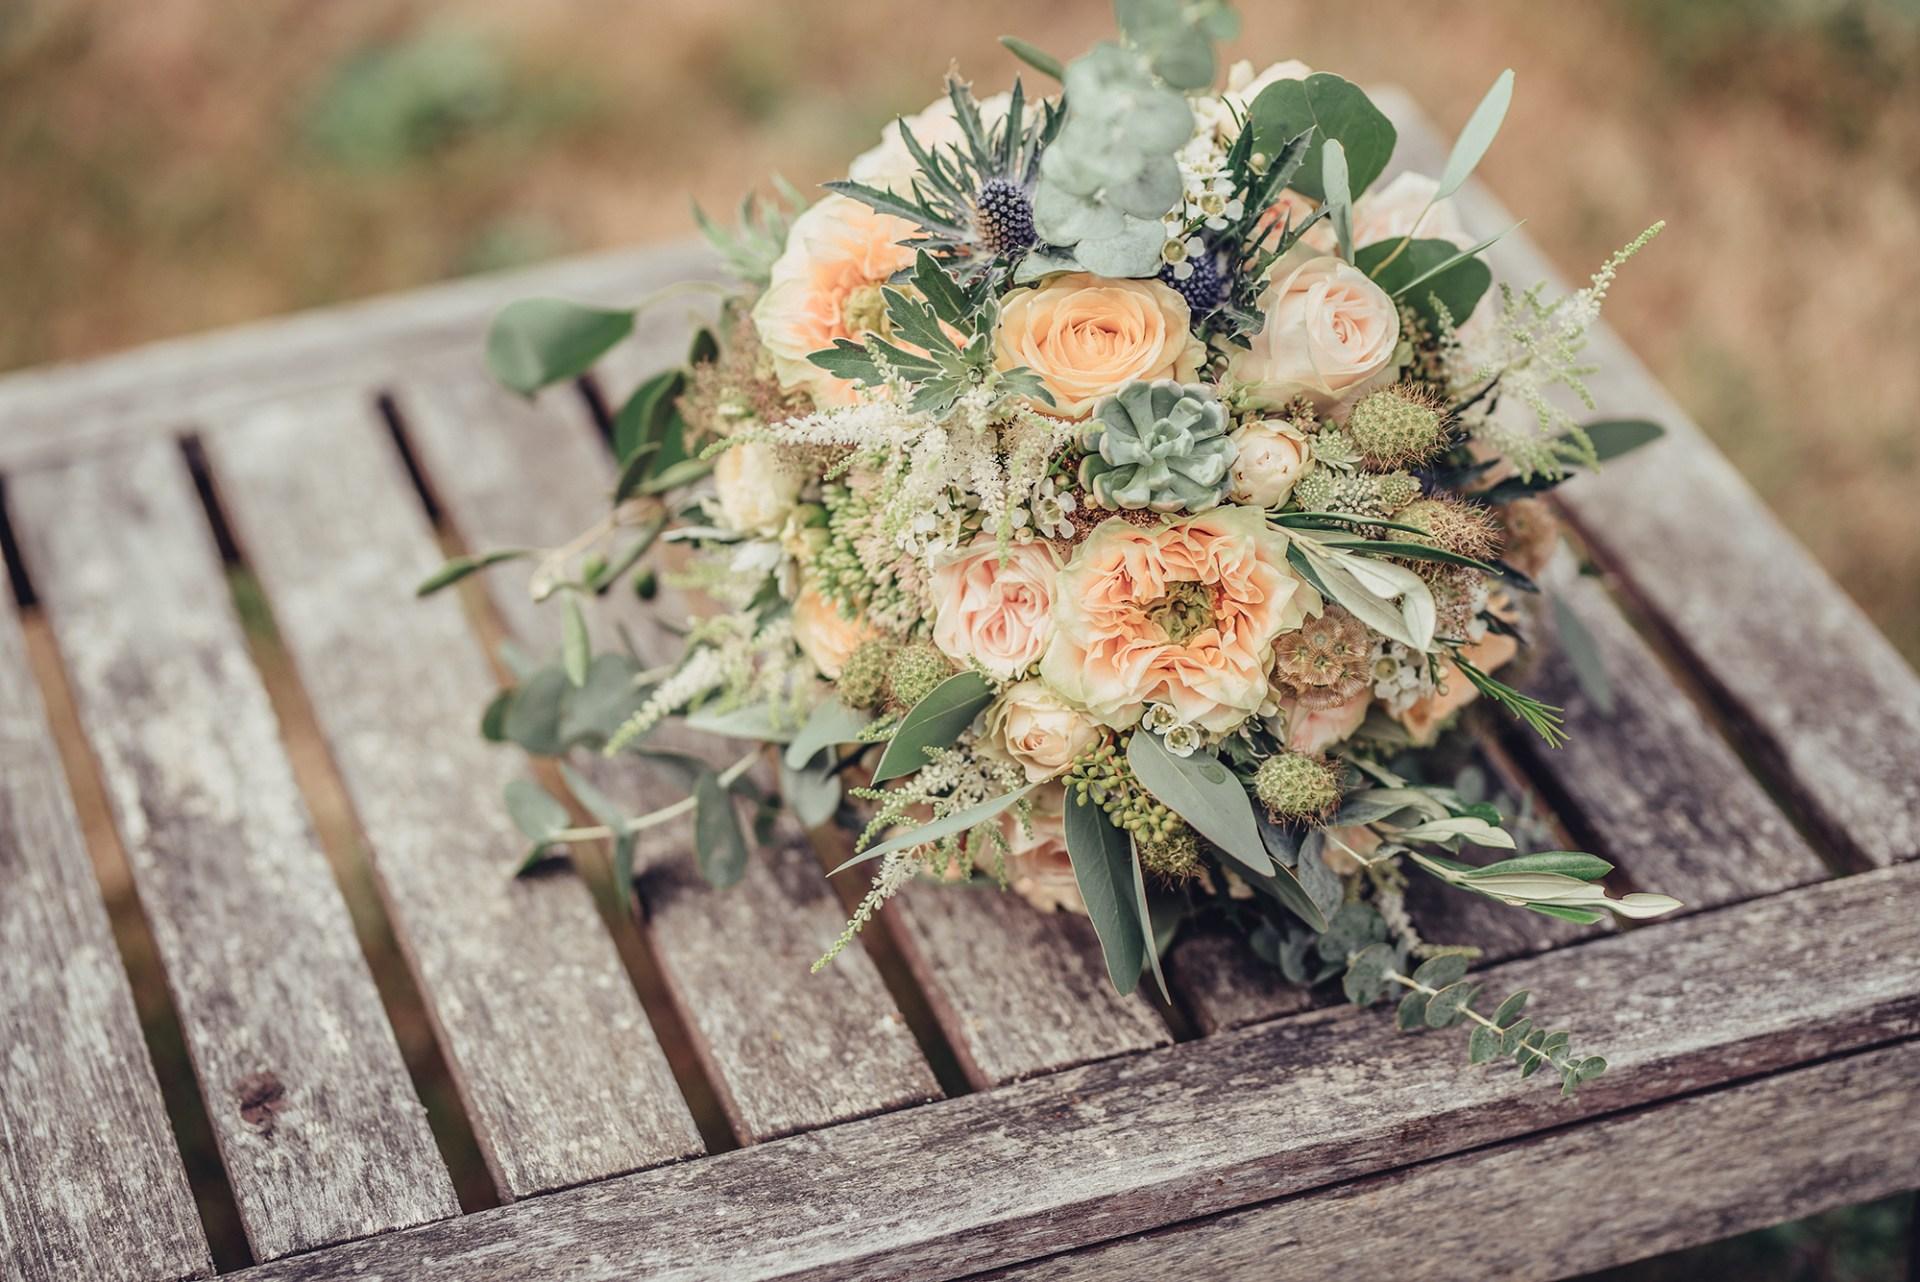 weddingseptemberluminoxx92348234129